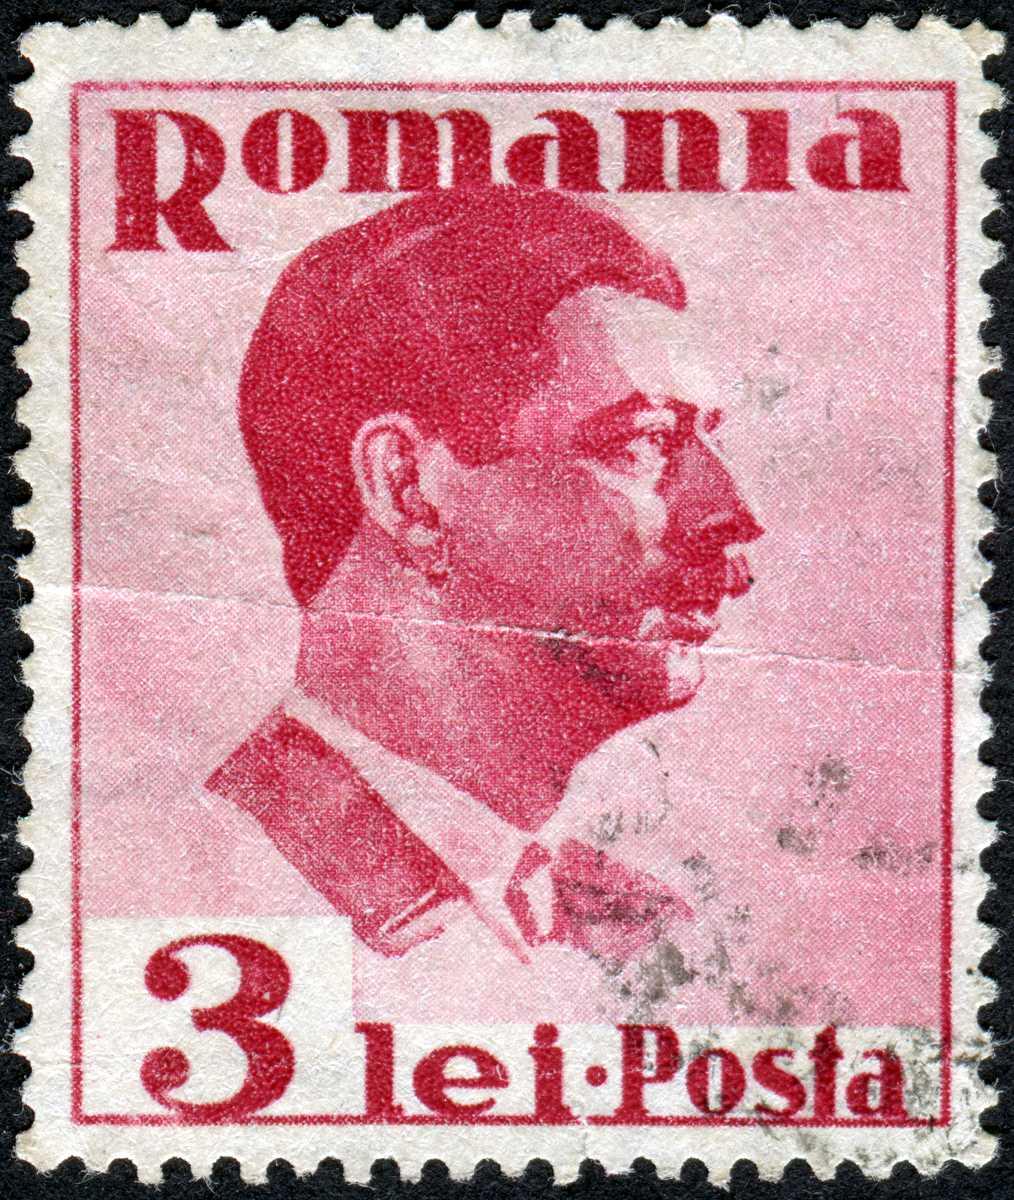 posta romana stamps of romania collecting lei and bani